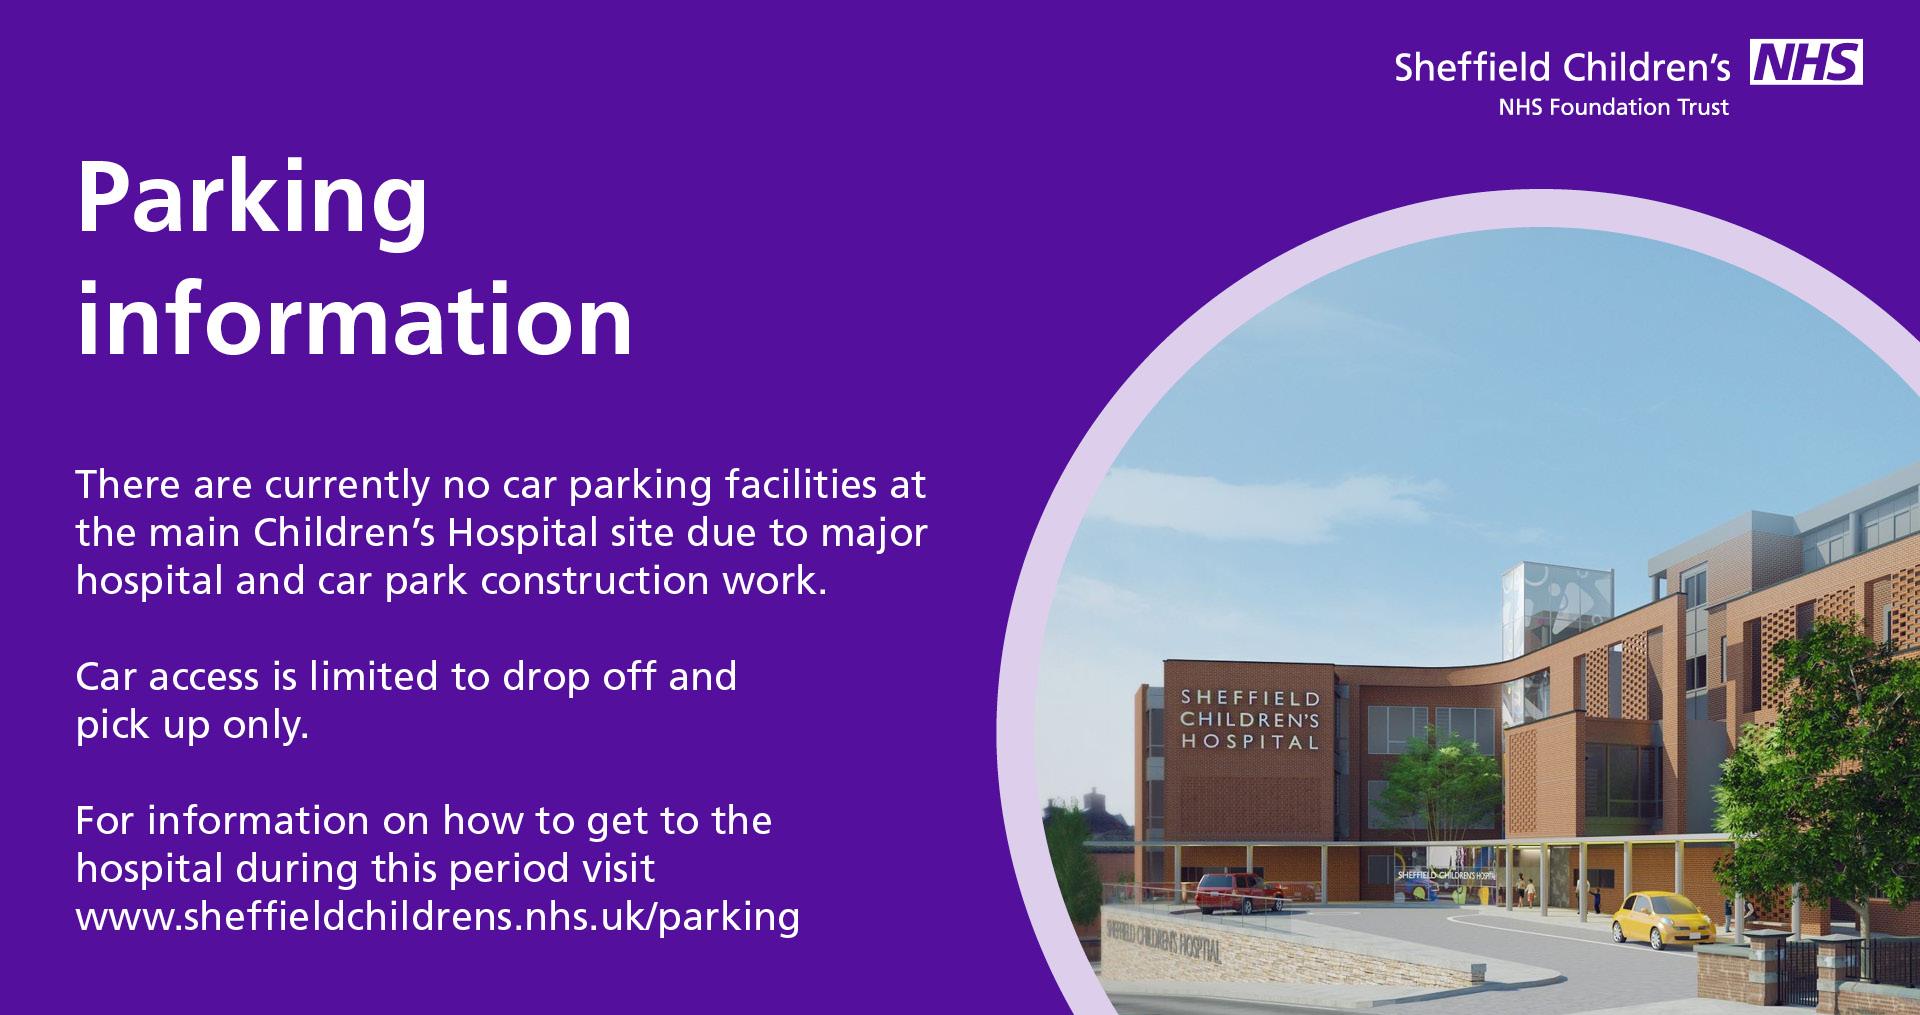 THMG-SC-ParkingInformation.jpg